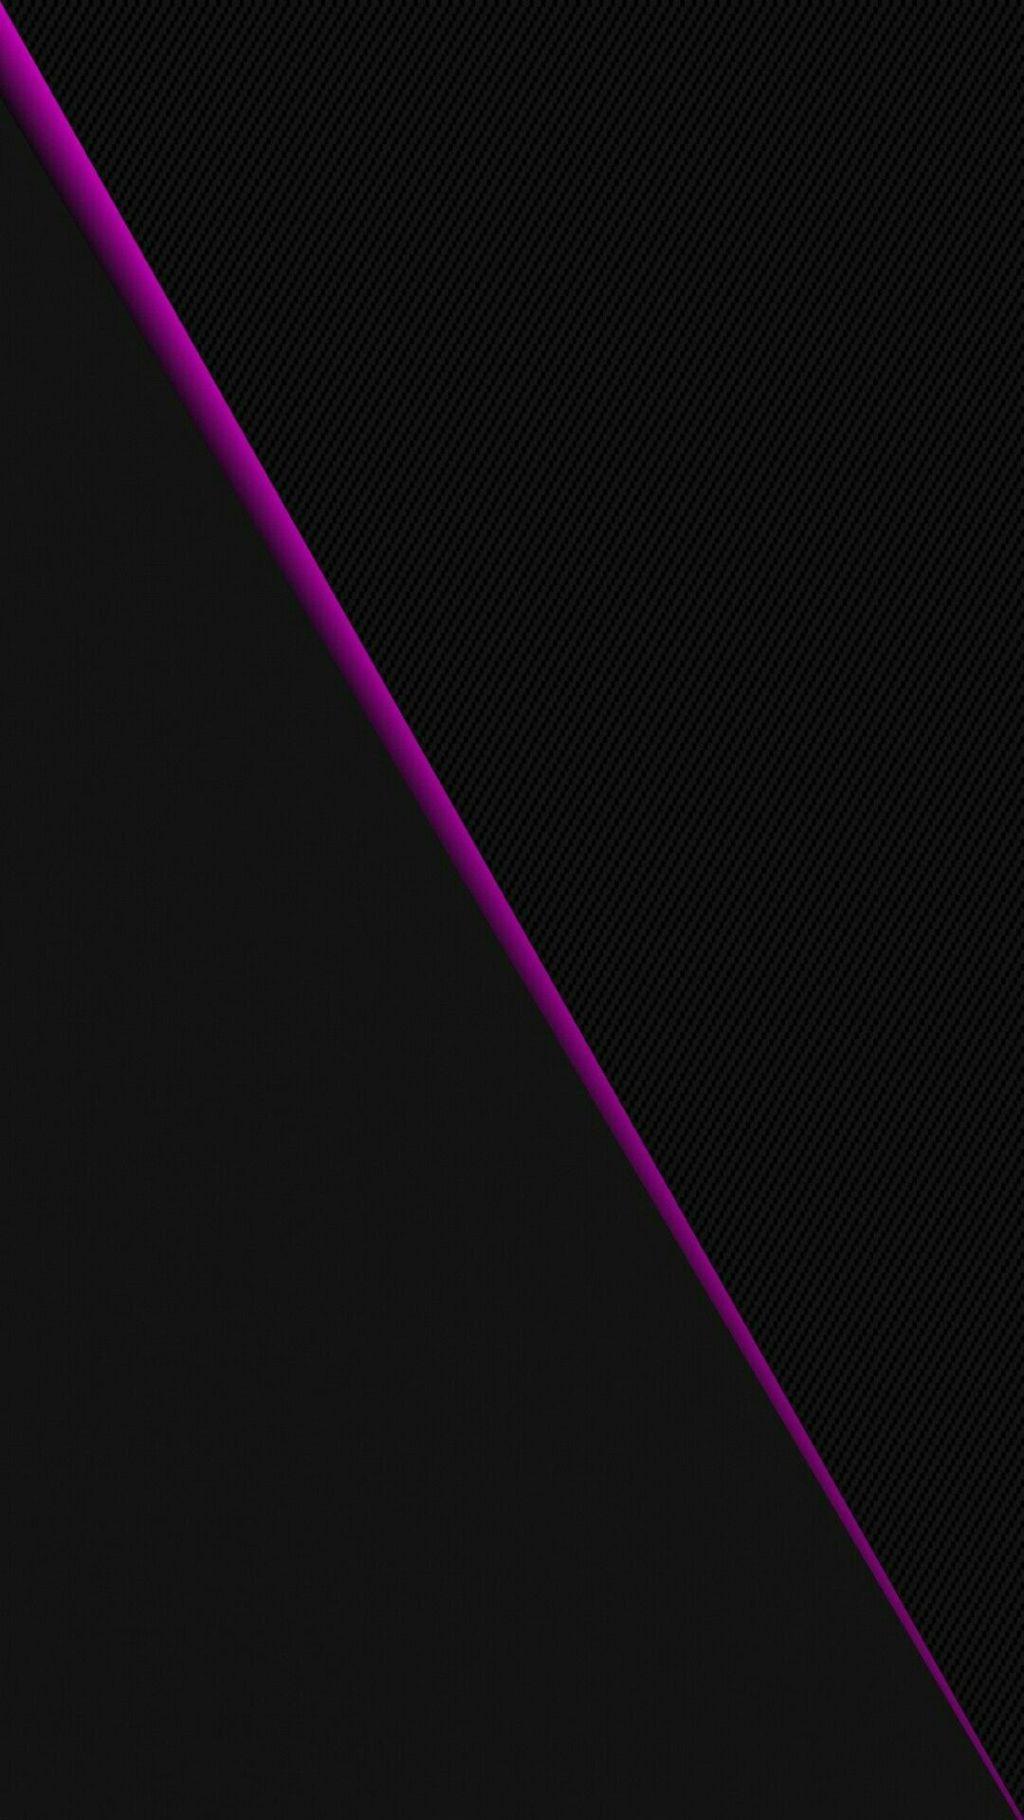 #wallpaper #plain #black #pink #wallpapers - Darkness - HD Wallpaper